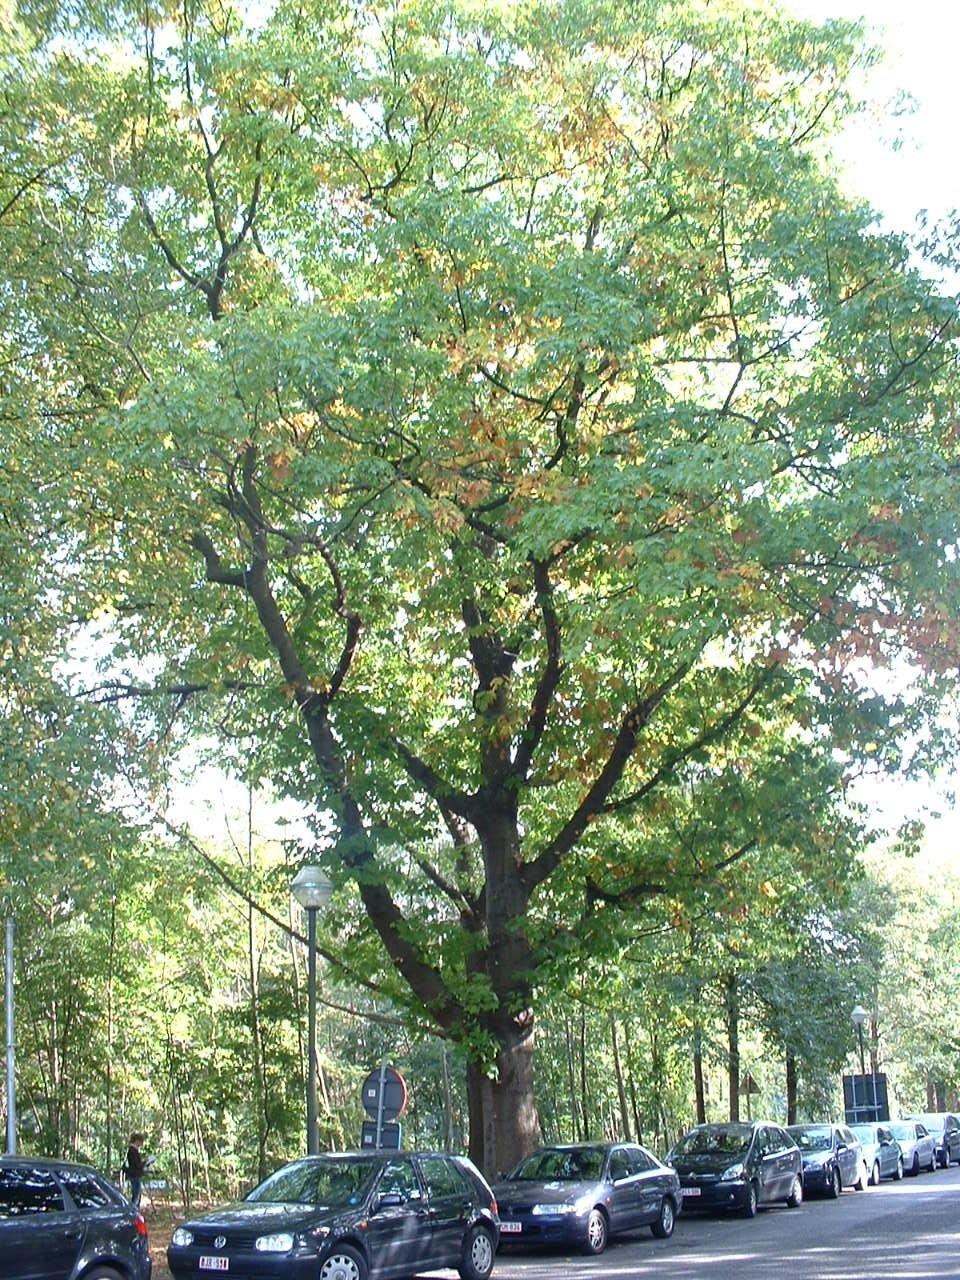 Amerikaanse eik – Brussel, Landschap van de Madridlaan, Madridlaan, 100 –  09 Oktober 2006